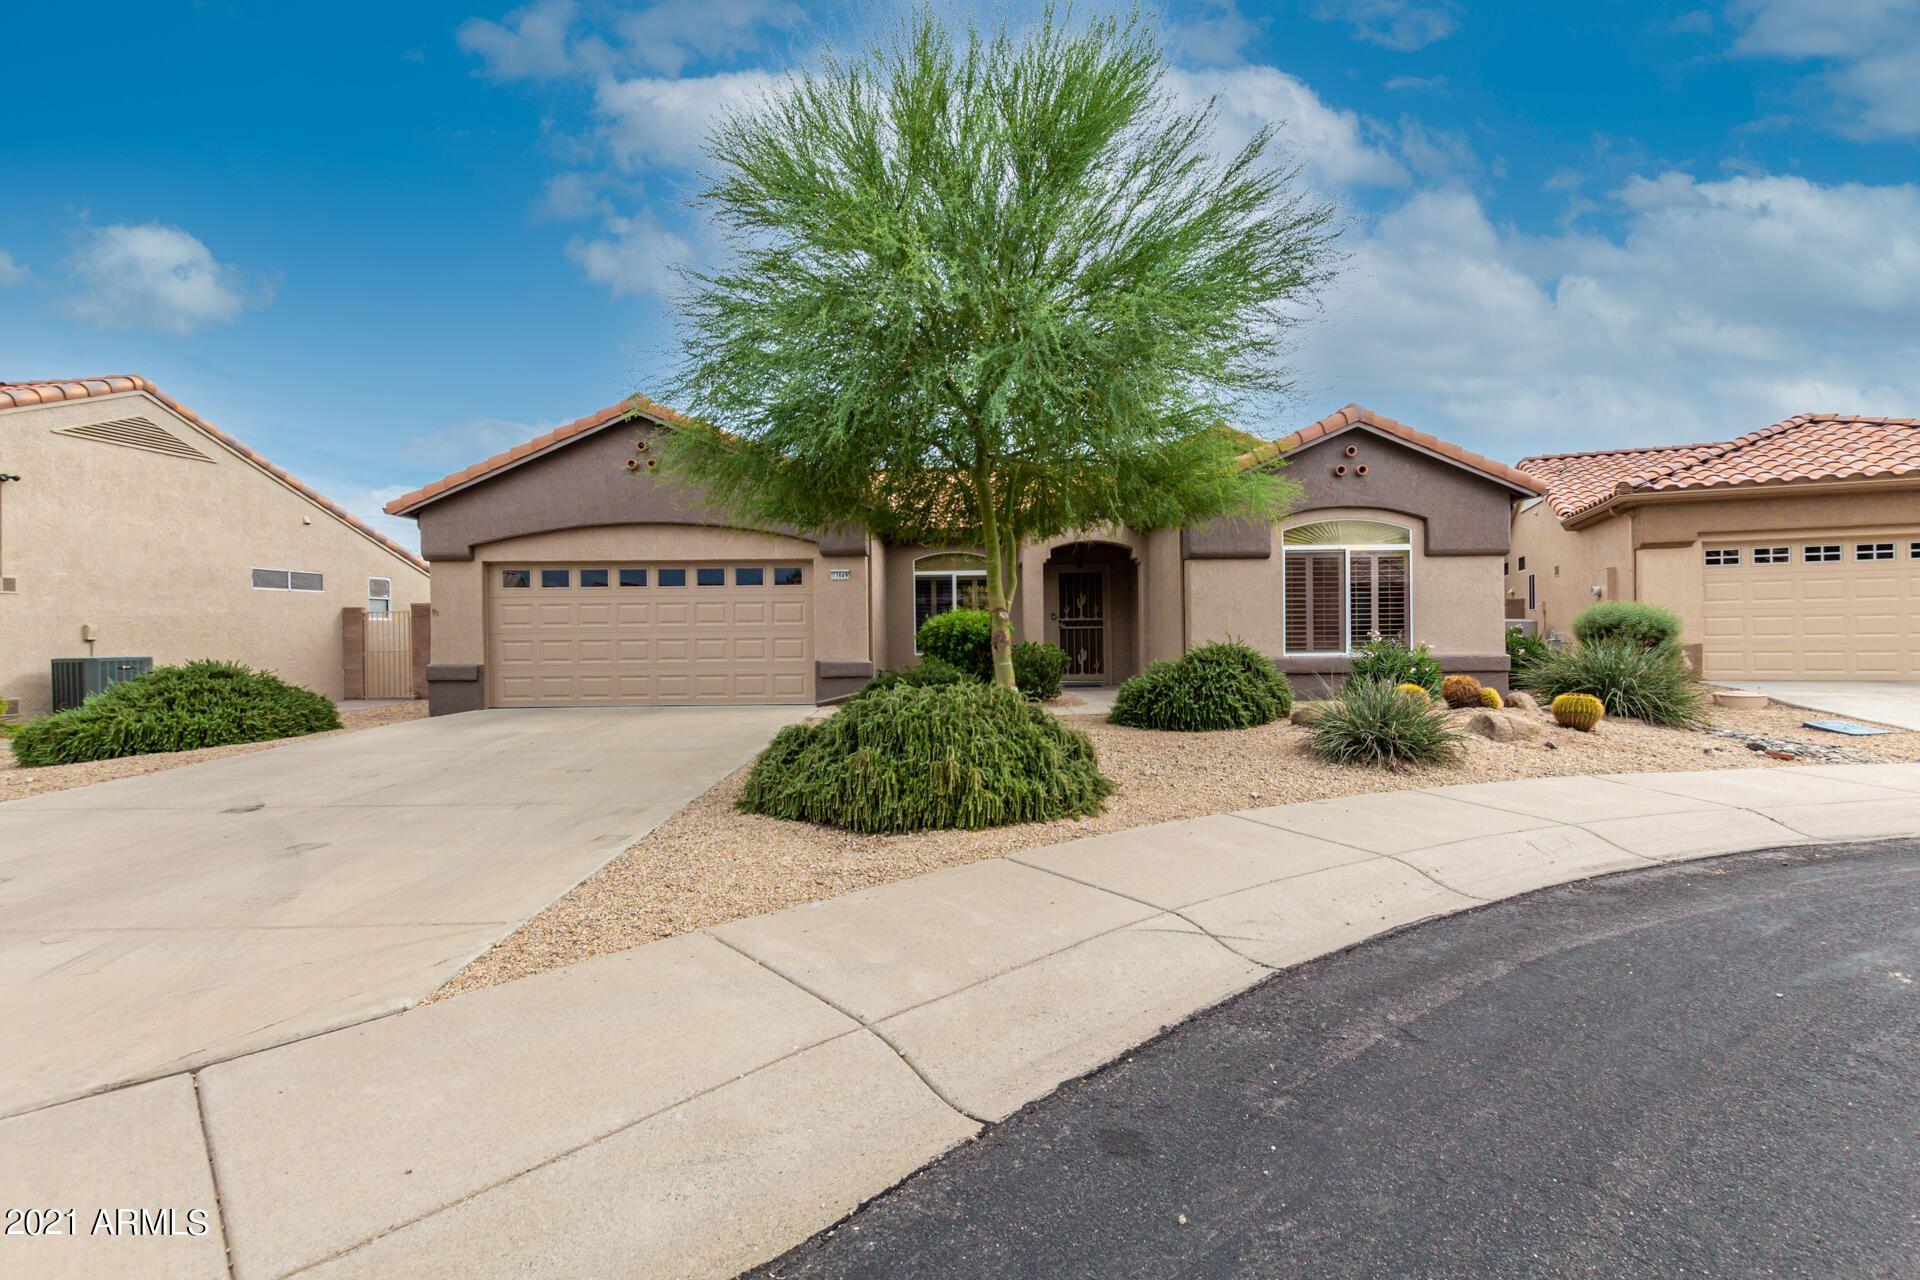 Photo of 13649 W CAVALCADE Drive, Sun City West, AZ 85375 (MLS # 6303205)